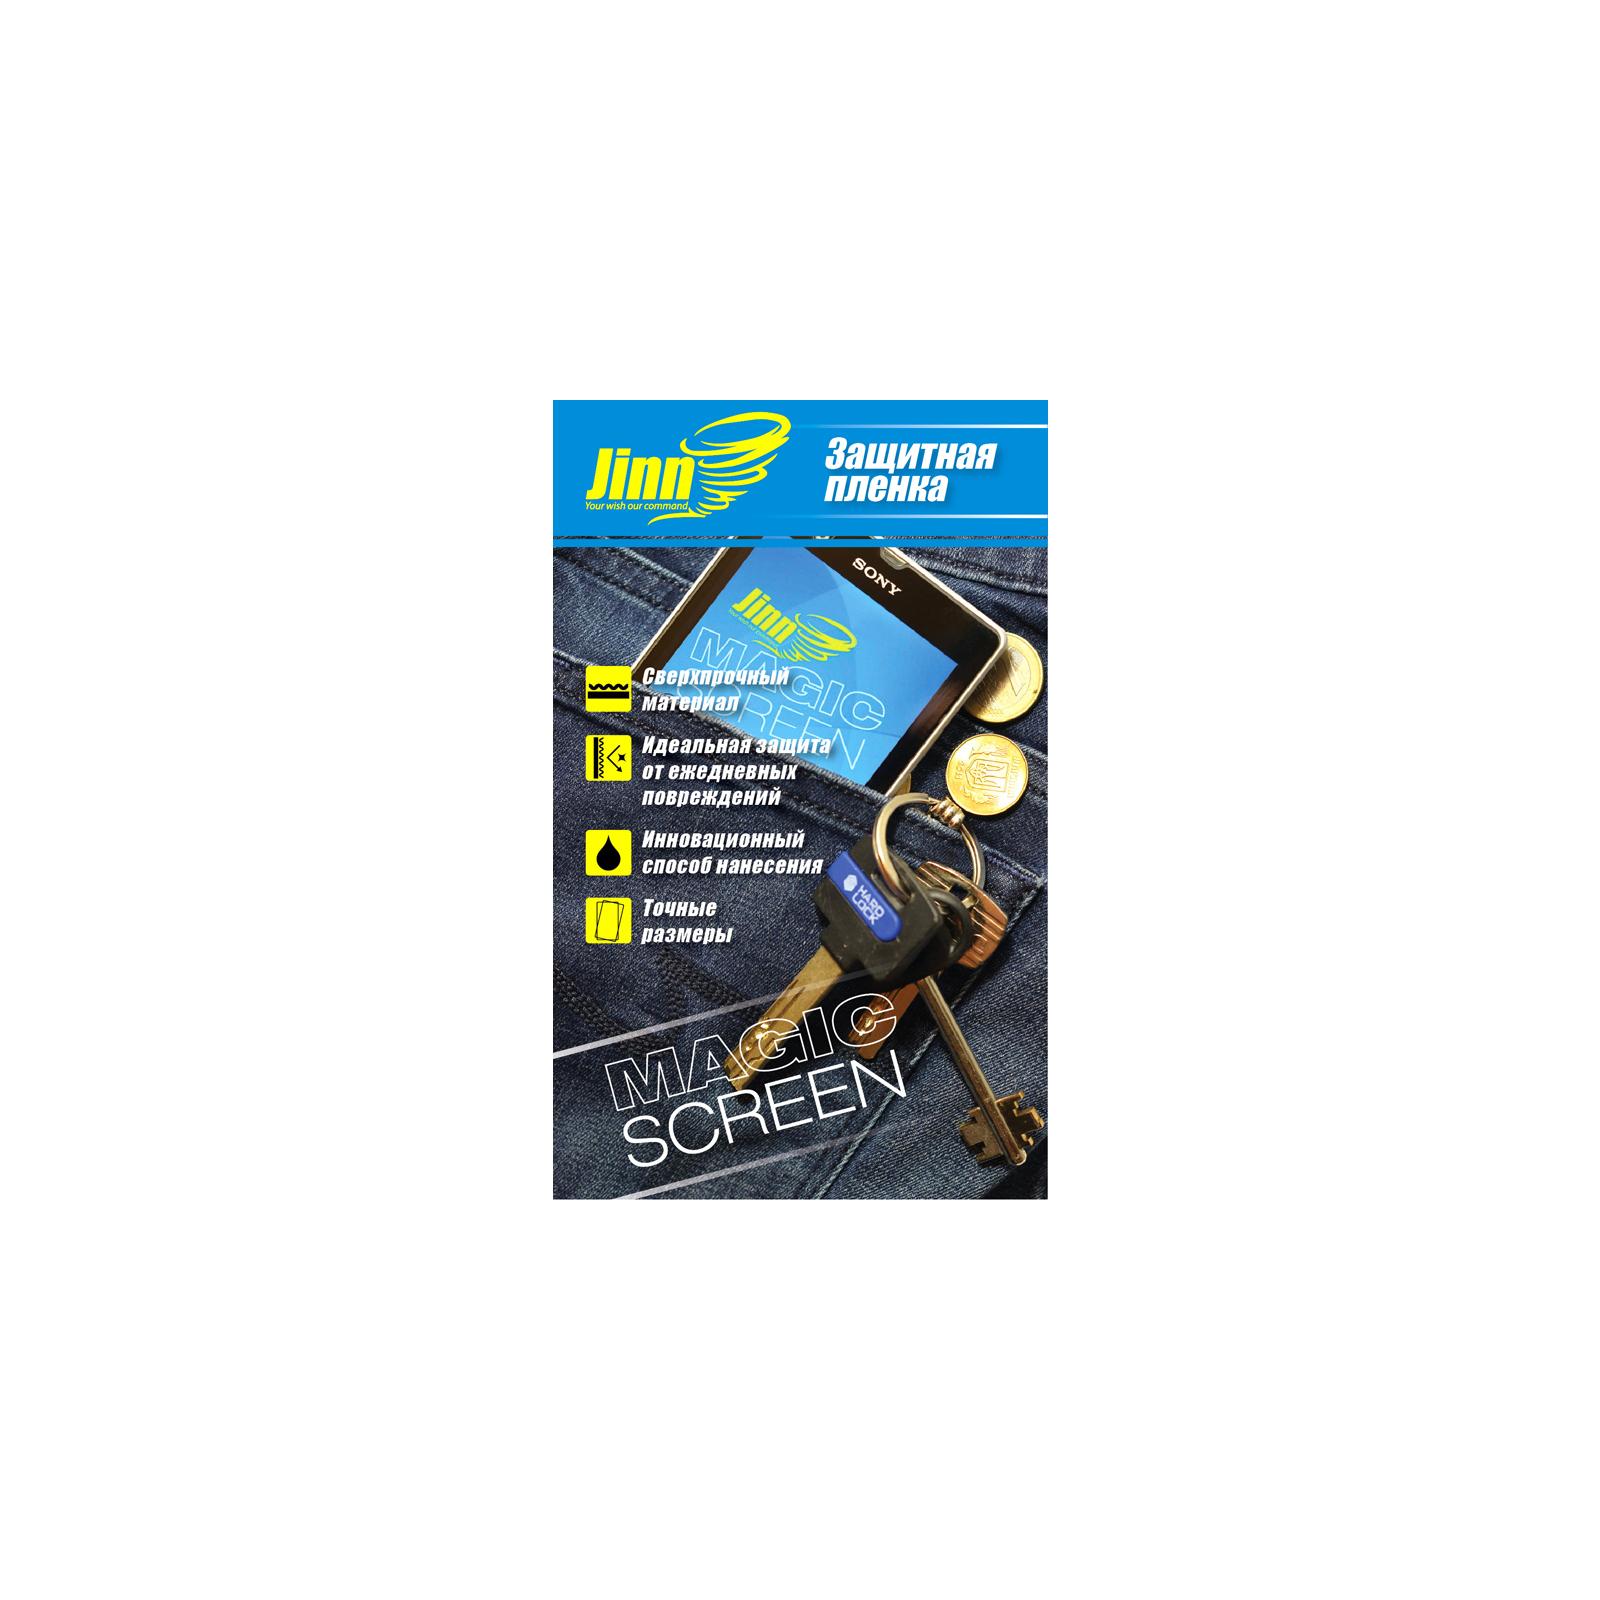 Пленка защитная JINN надміцна Magic Screen для Sony Xperia Miro ST23i (захист екр (Sony Xperia Miro front)